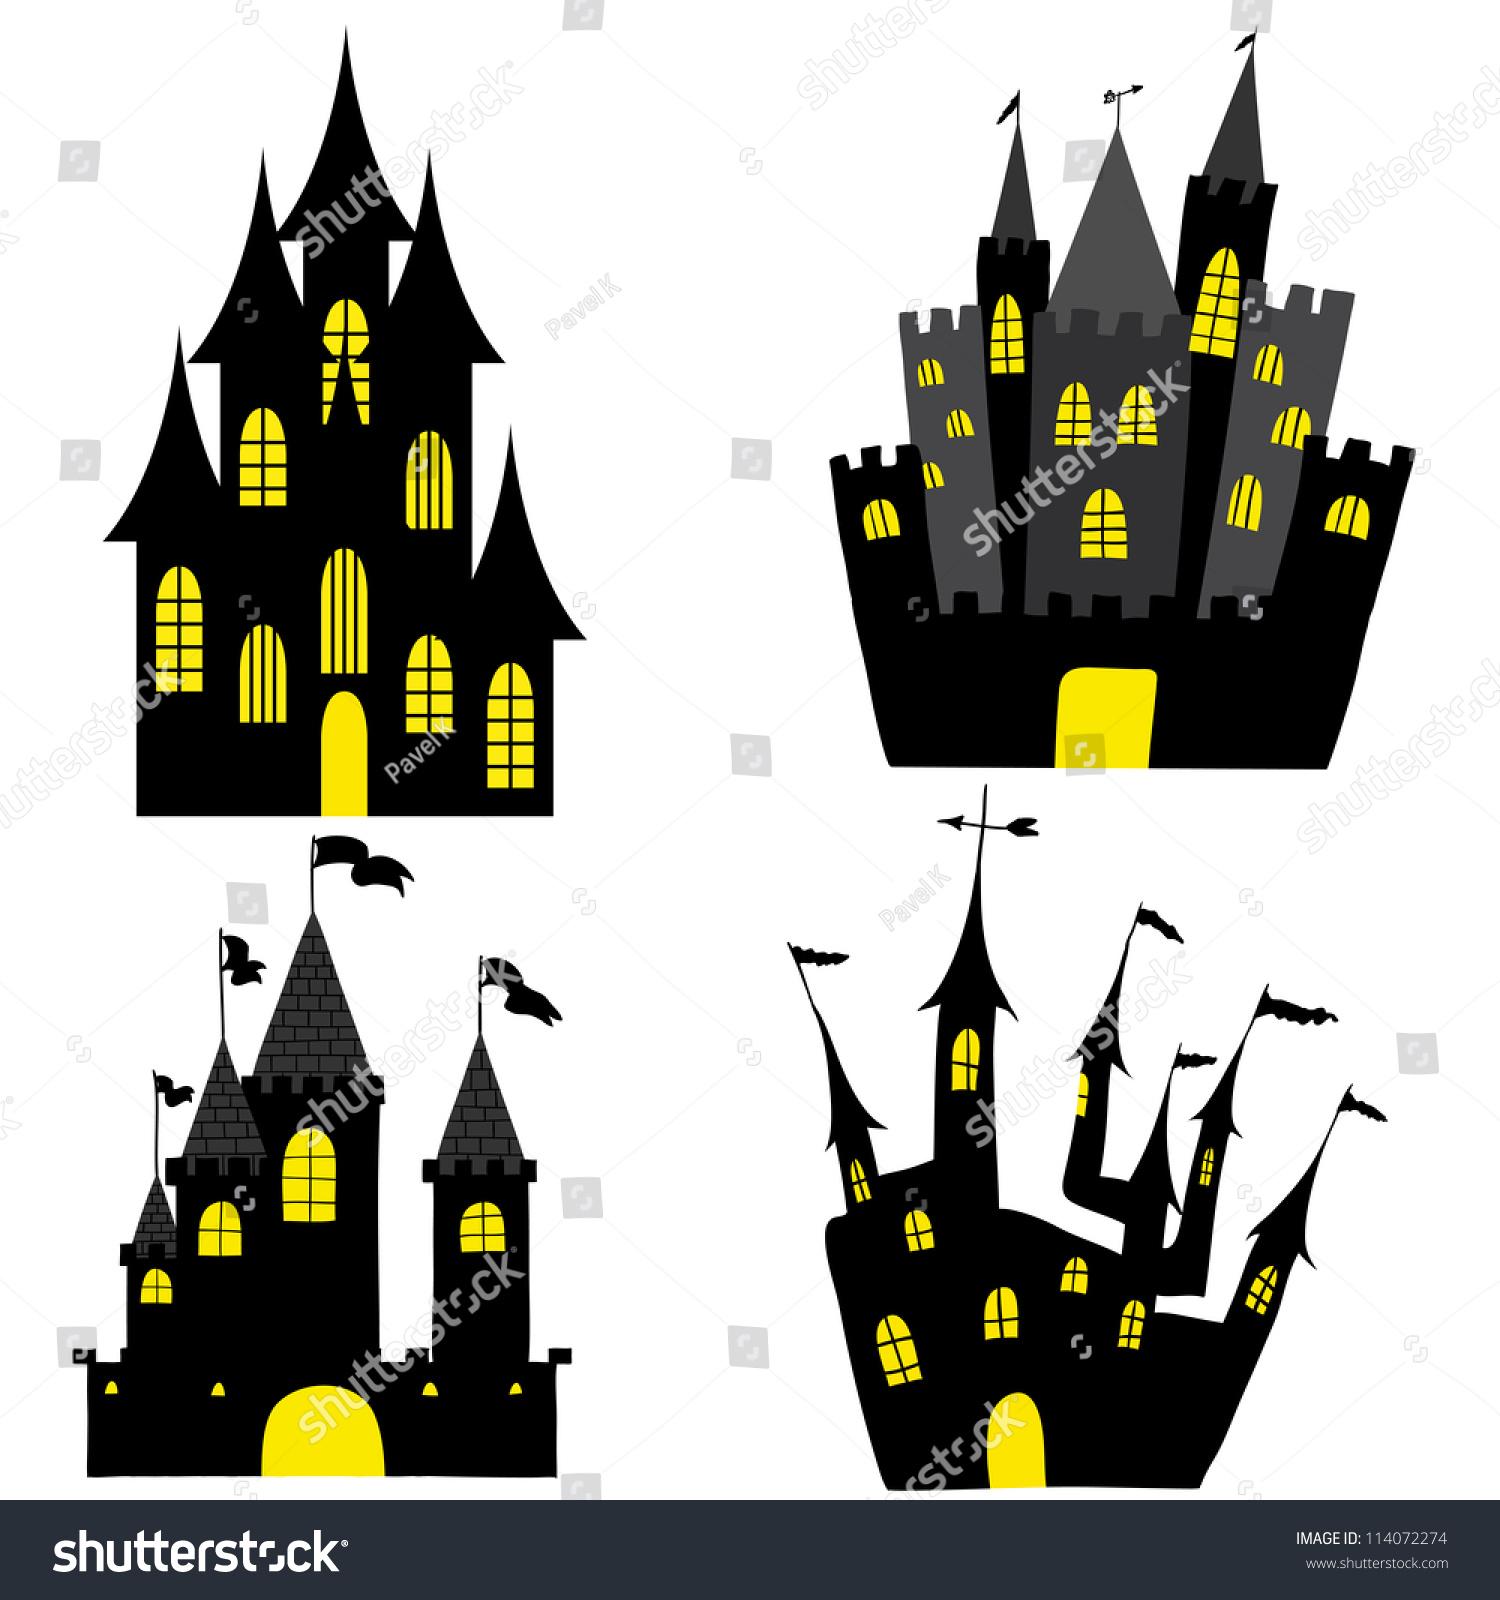 set halloween black castle yellow windows stock vector 114072274